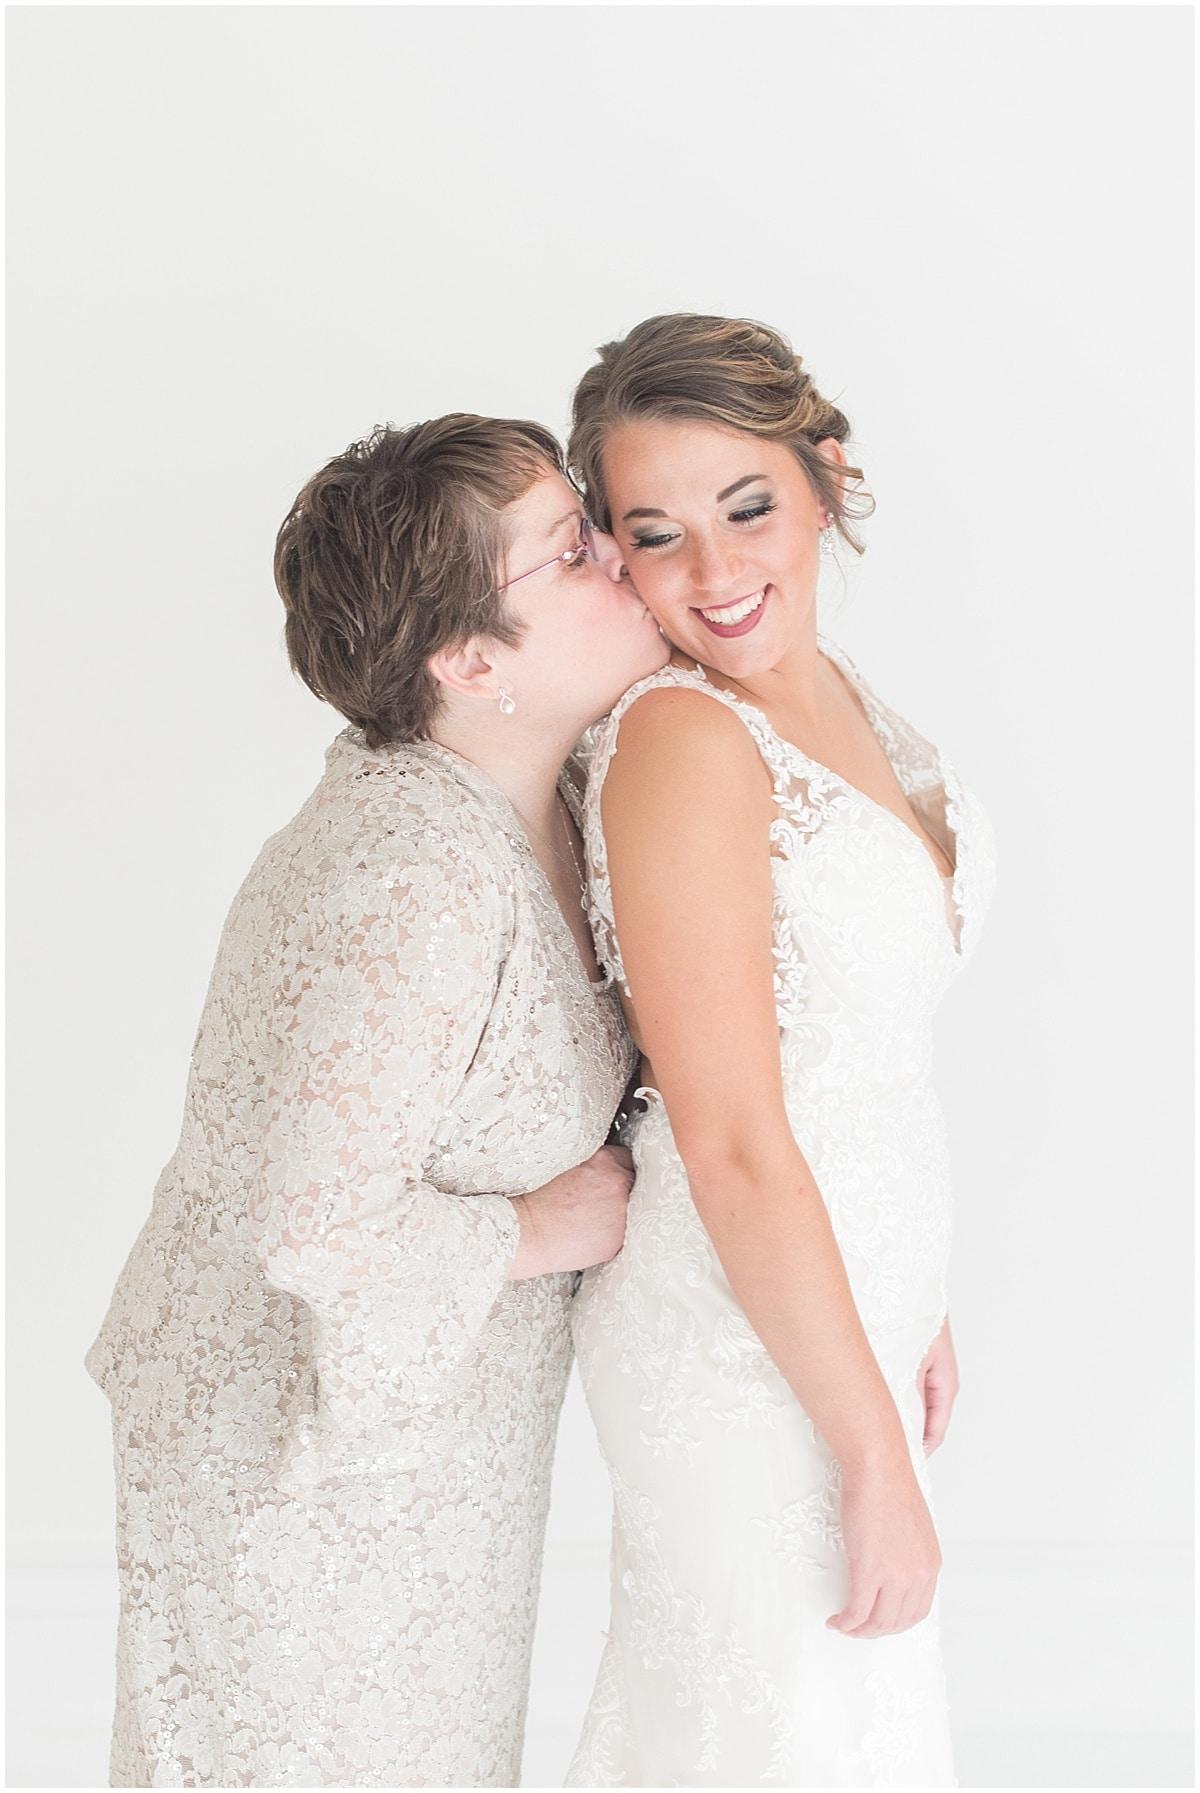 Seward Wedding/ Wedding at the Lahr Atrium in Lafayette, Indiana 7.jpg